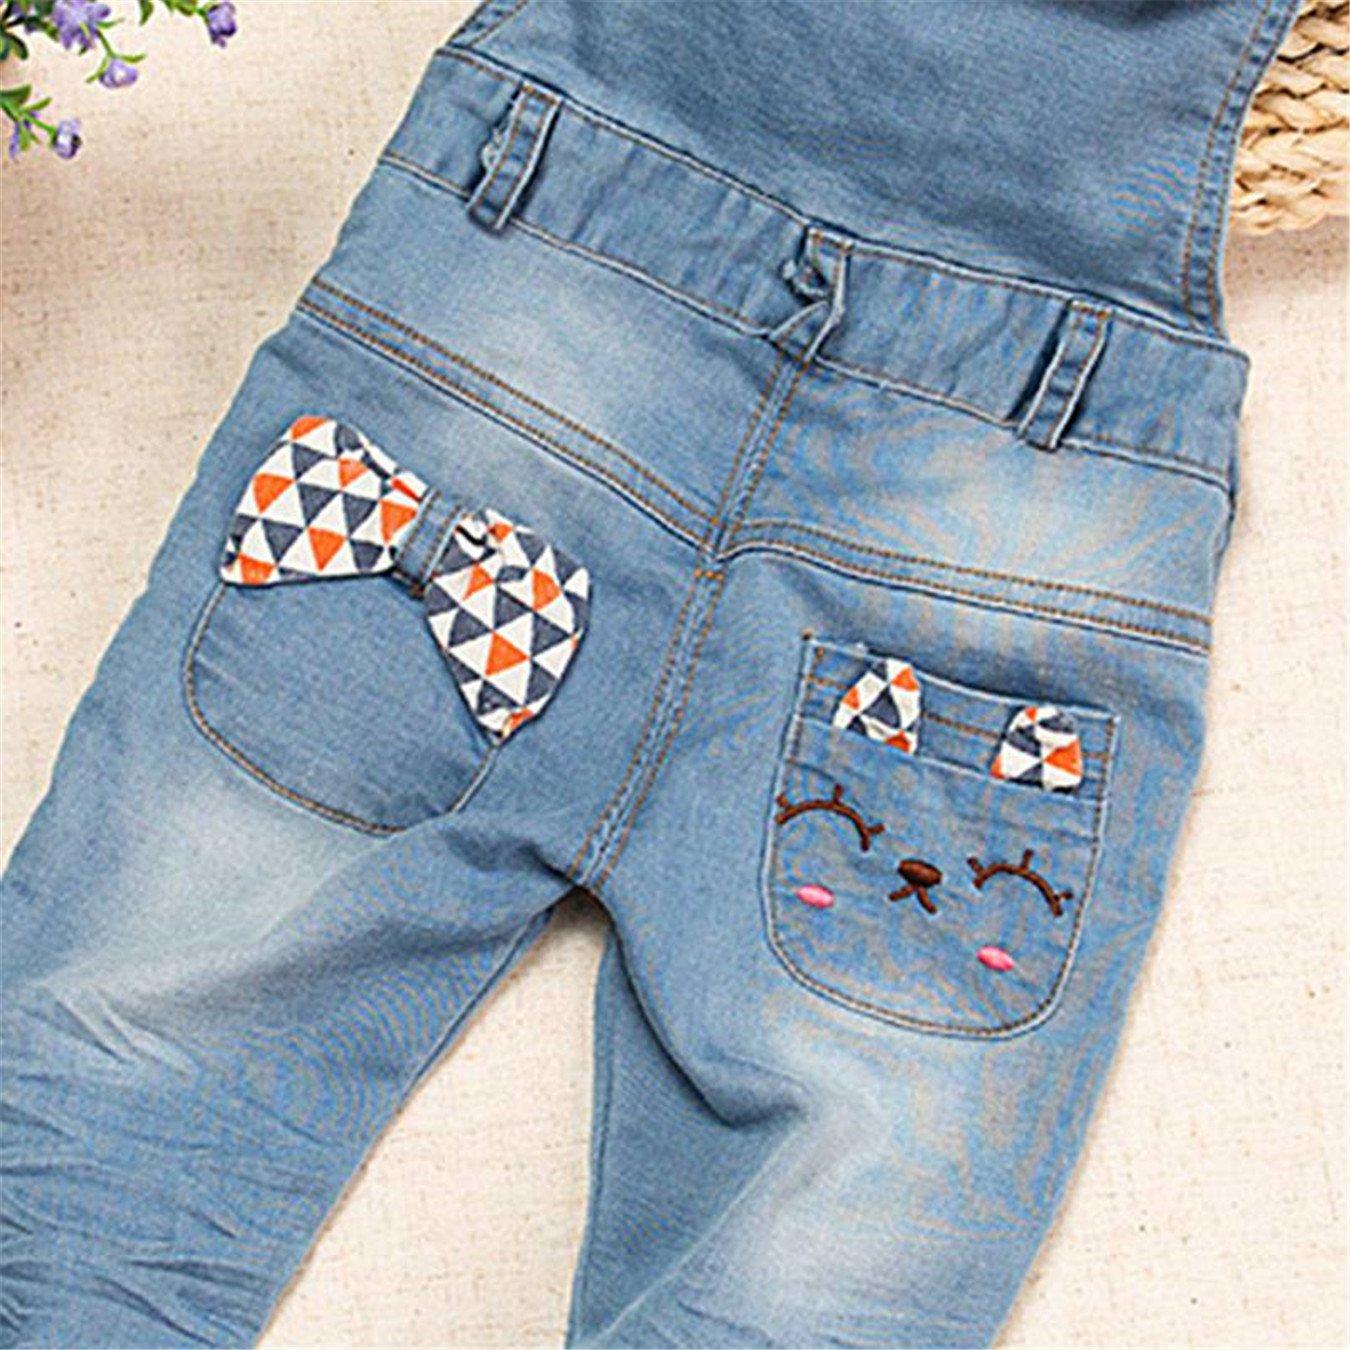 Amazon.com: B Annie - Pantalones vaqueros de primavera para ...